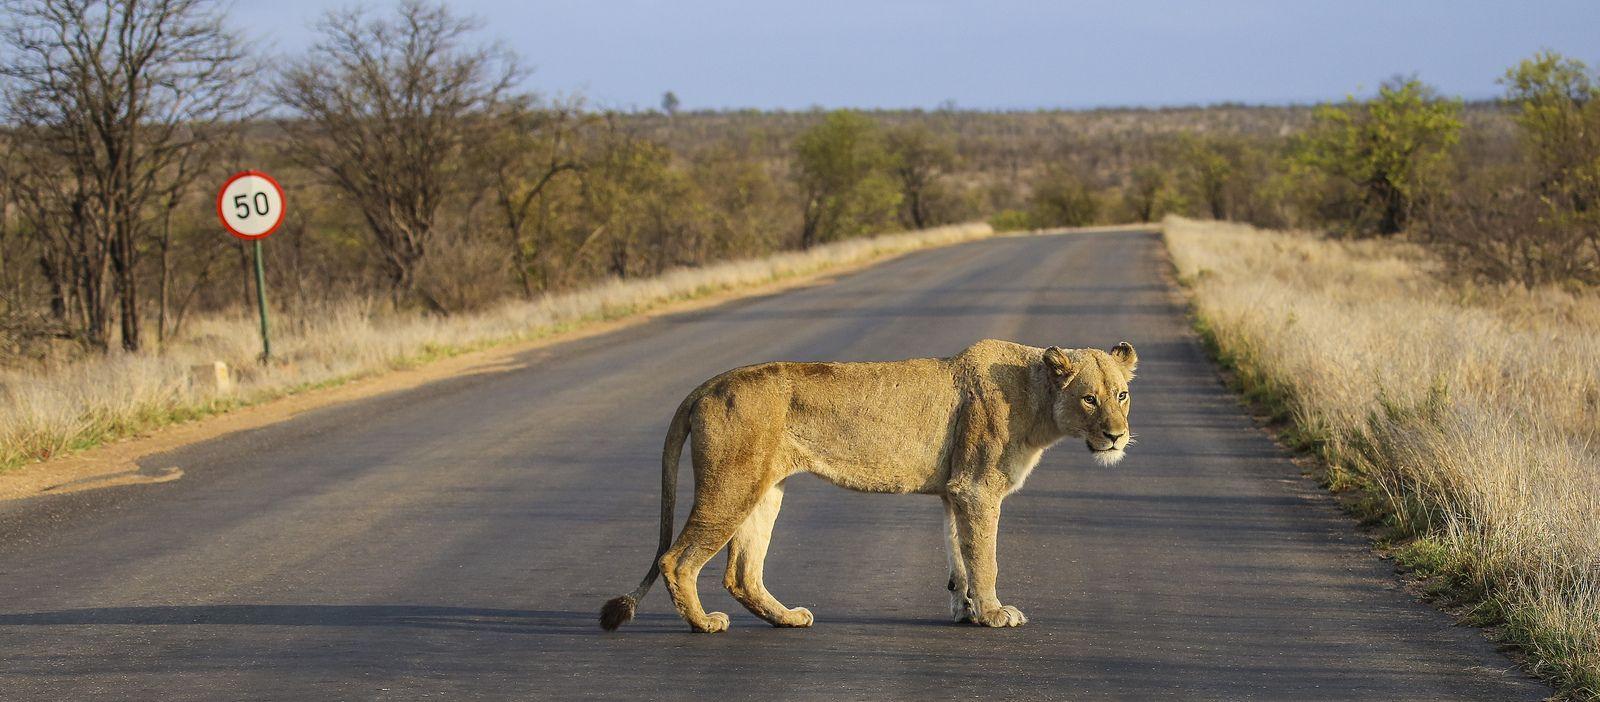 lioness | Flickr - Photo Sharing!